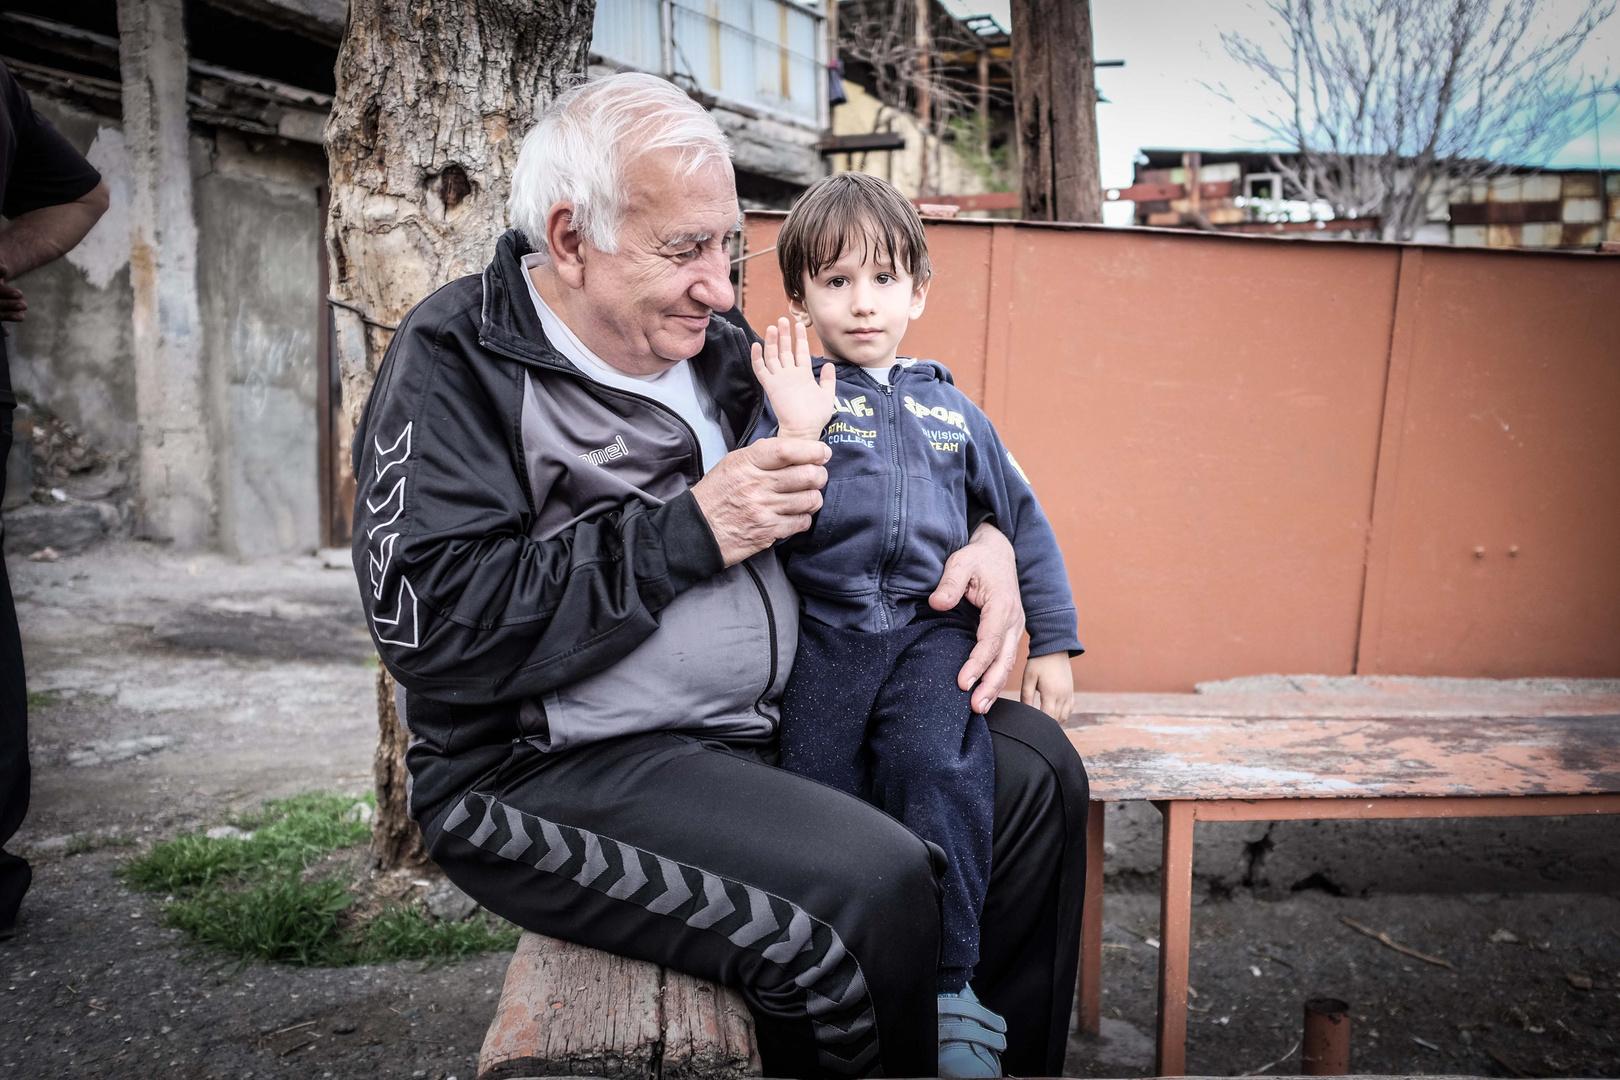 Großvater und Enkel in Kond/Yerevan (Armenien)